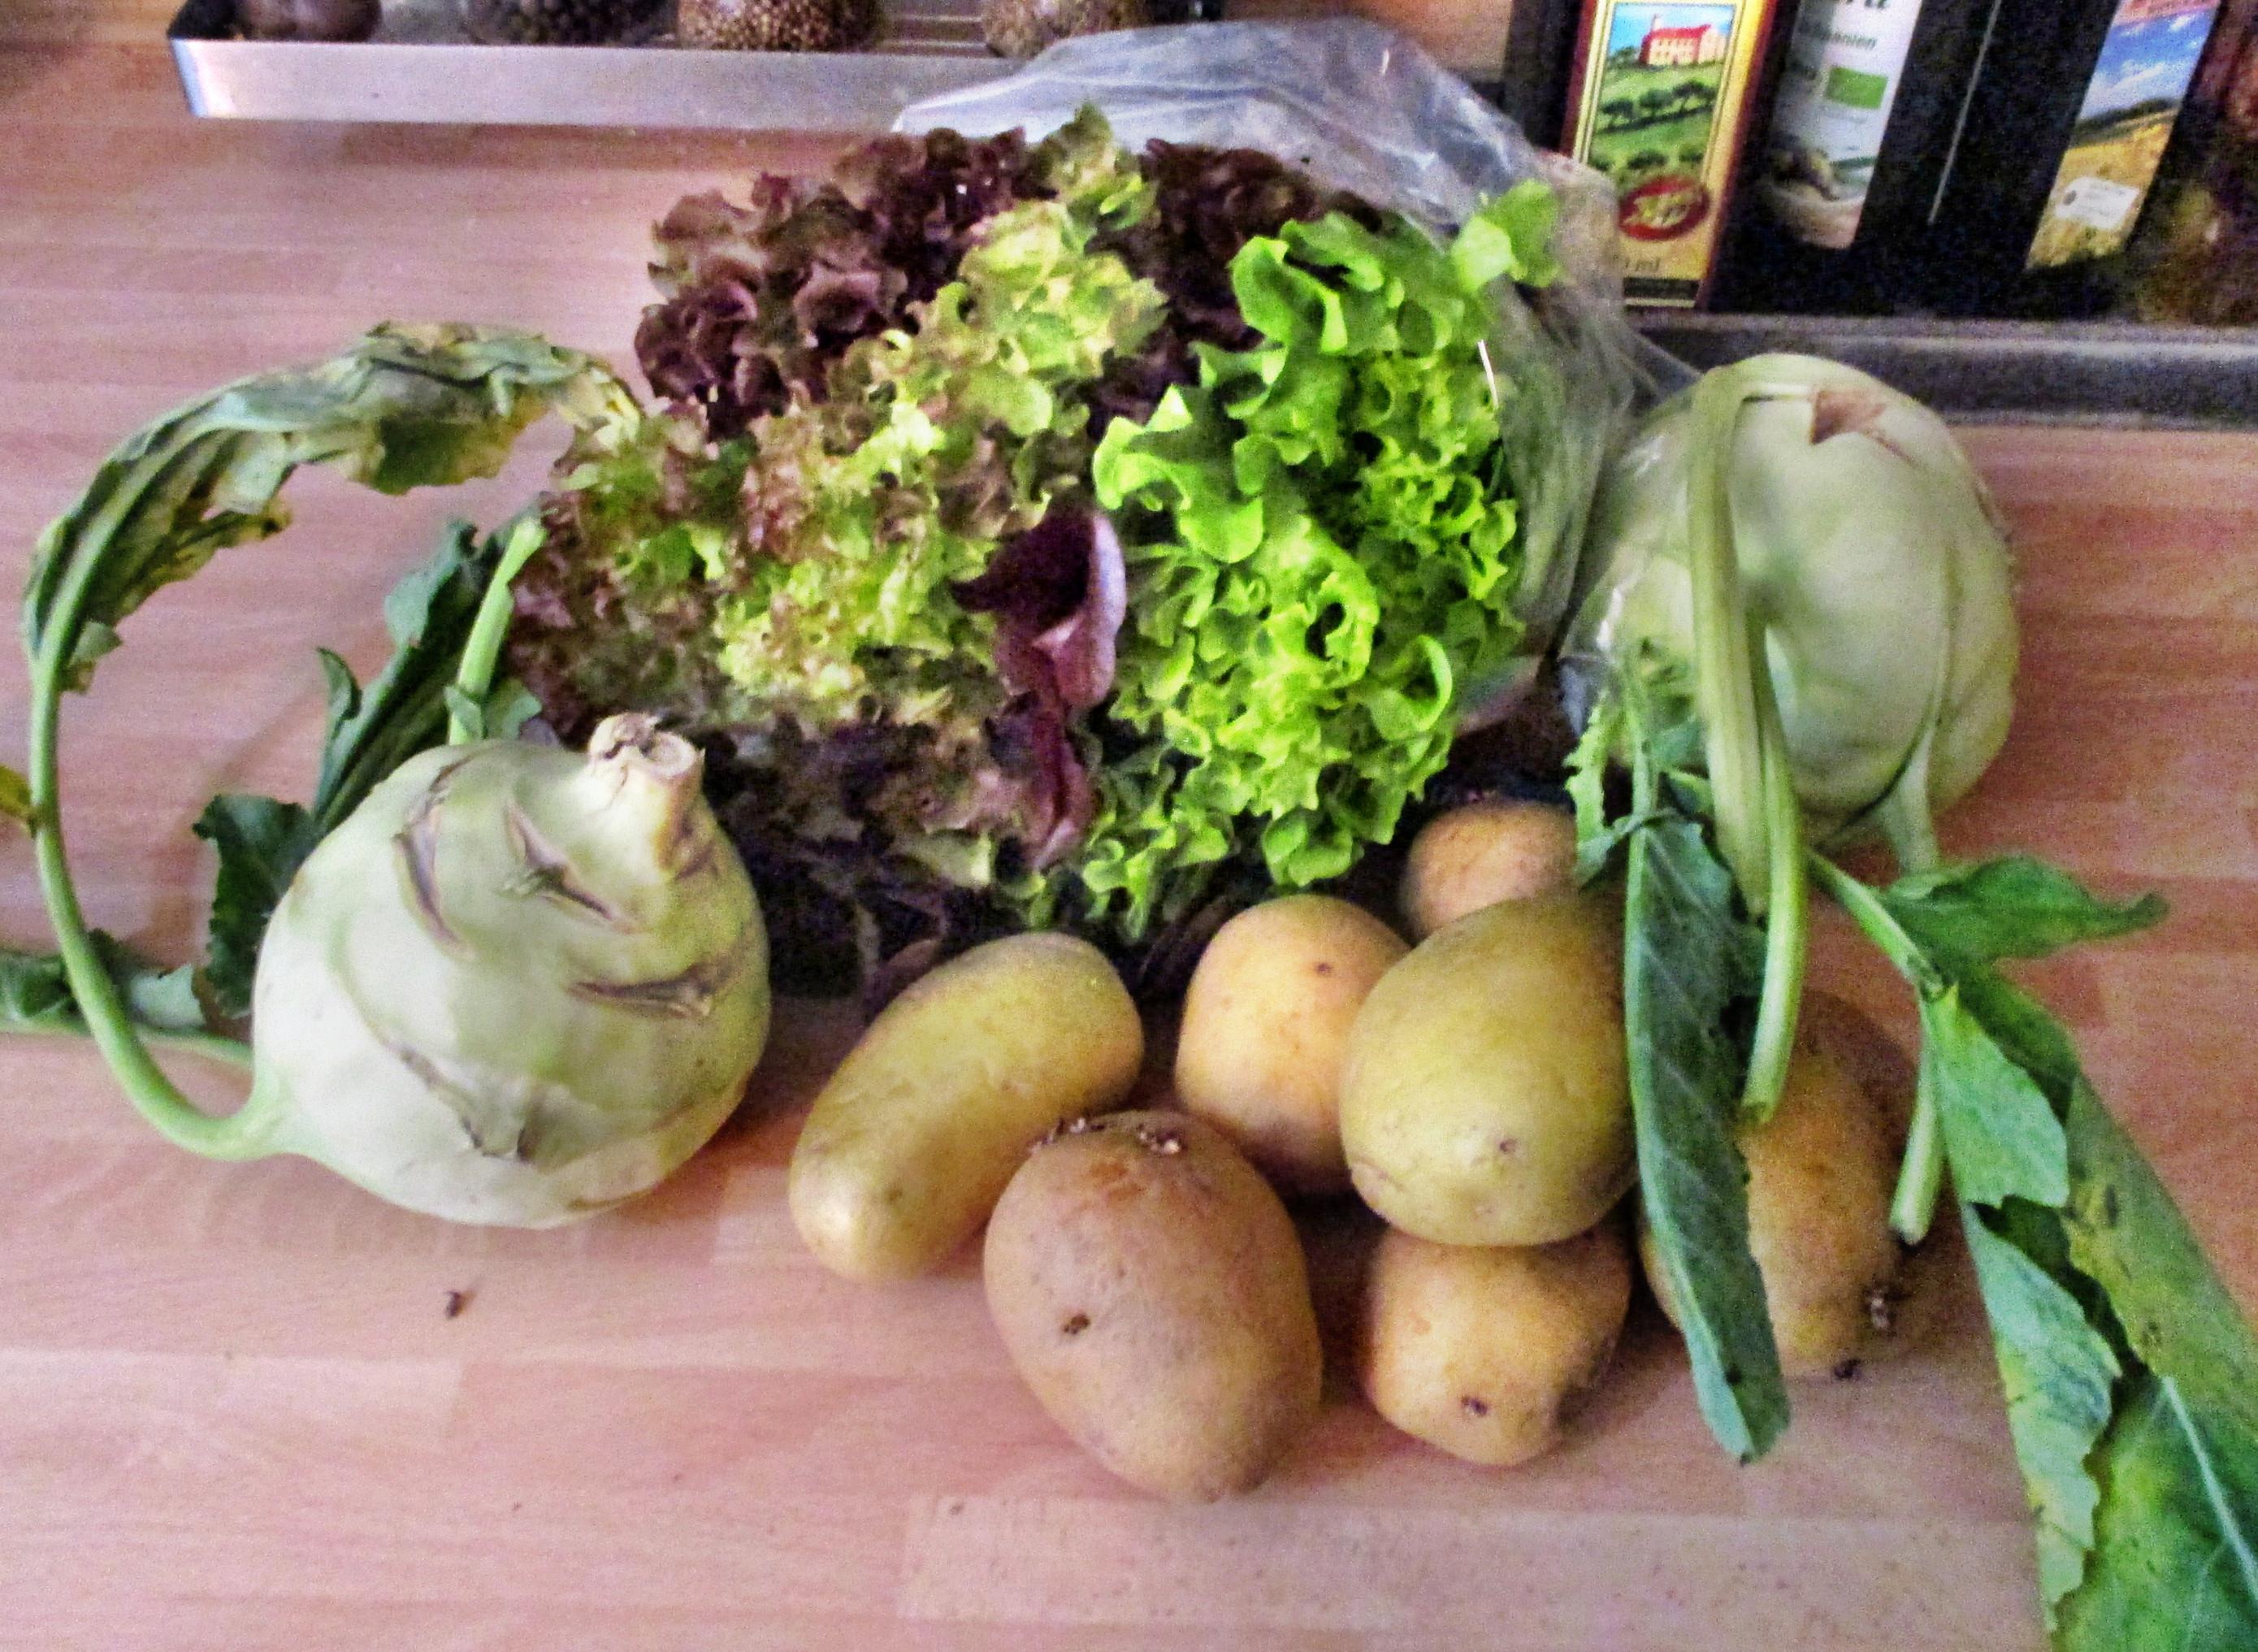 Kabeljau,Kohlrabigemüse,Salzkartoffeln,Salat -9.6.15   (1)